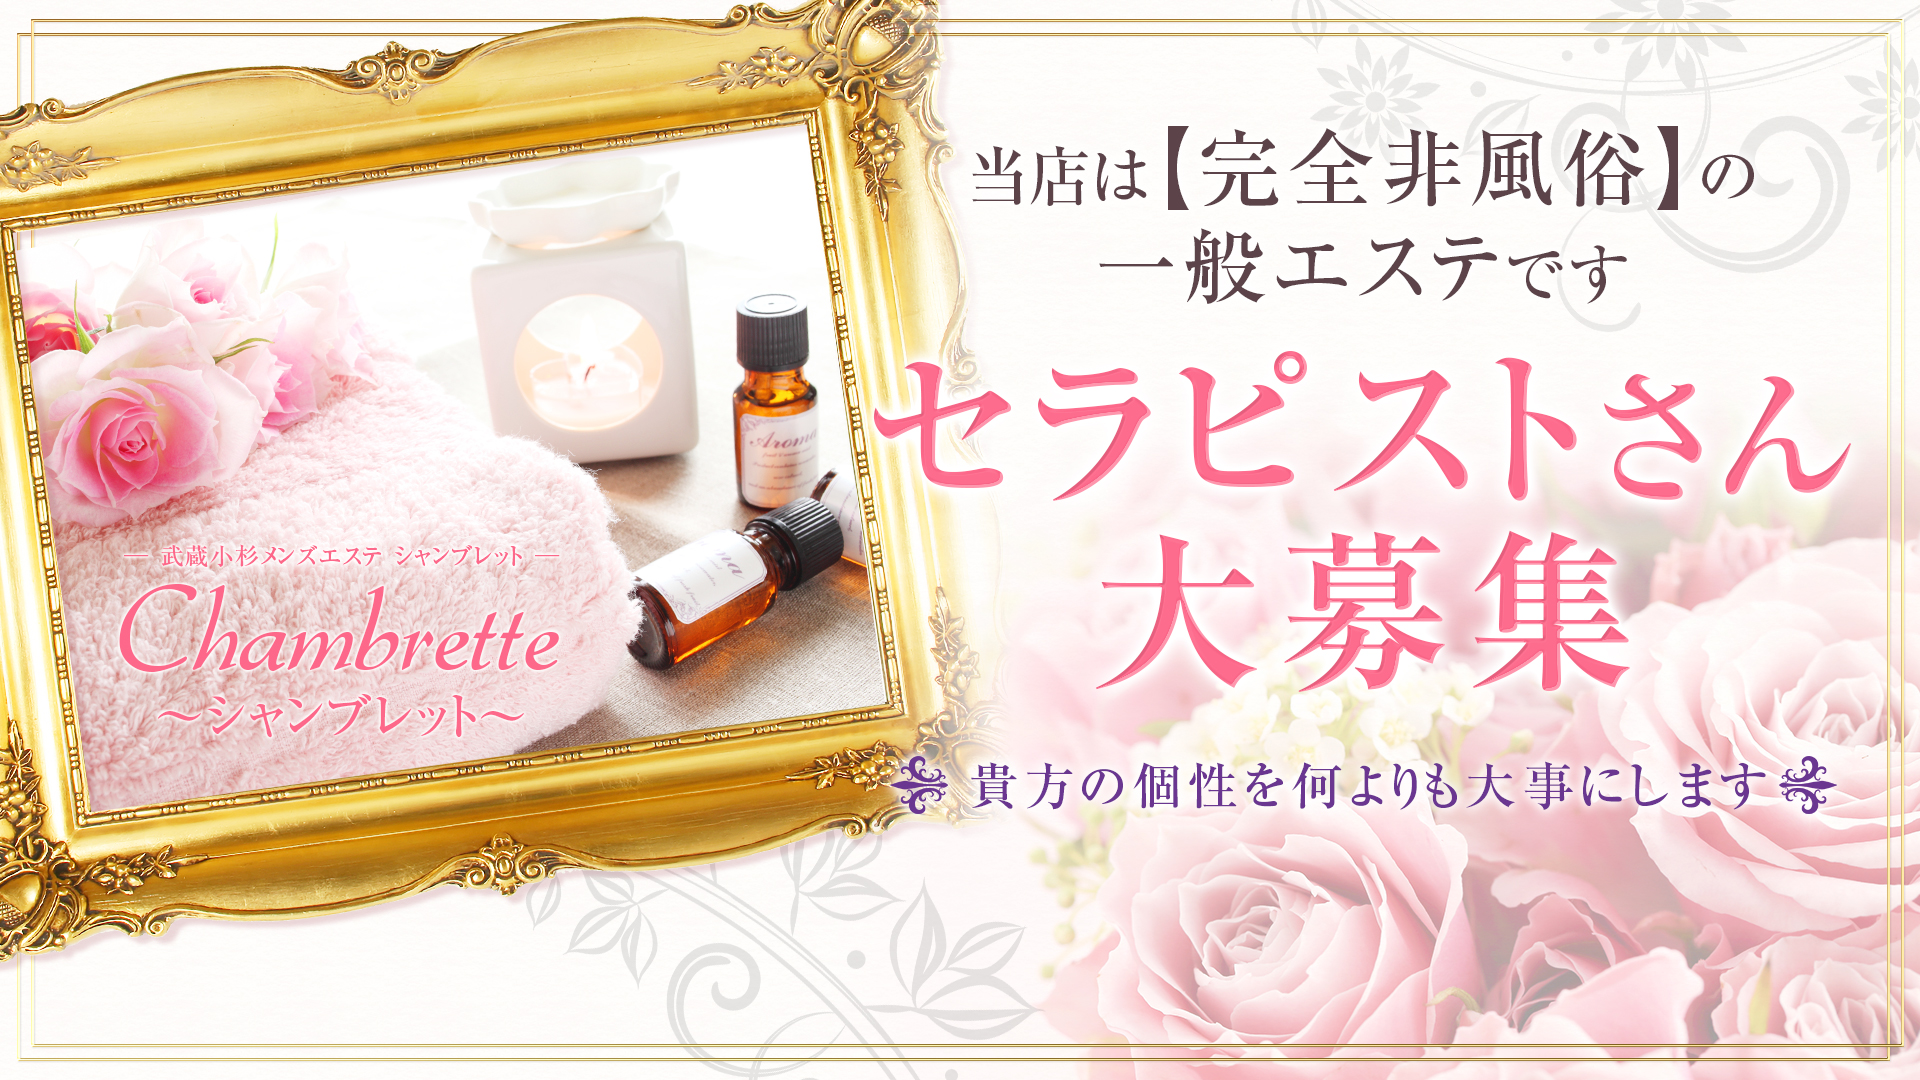 chambrette~シャンブレット